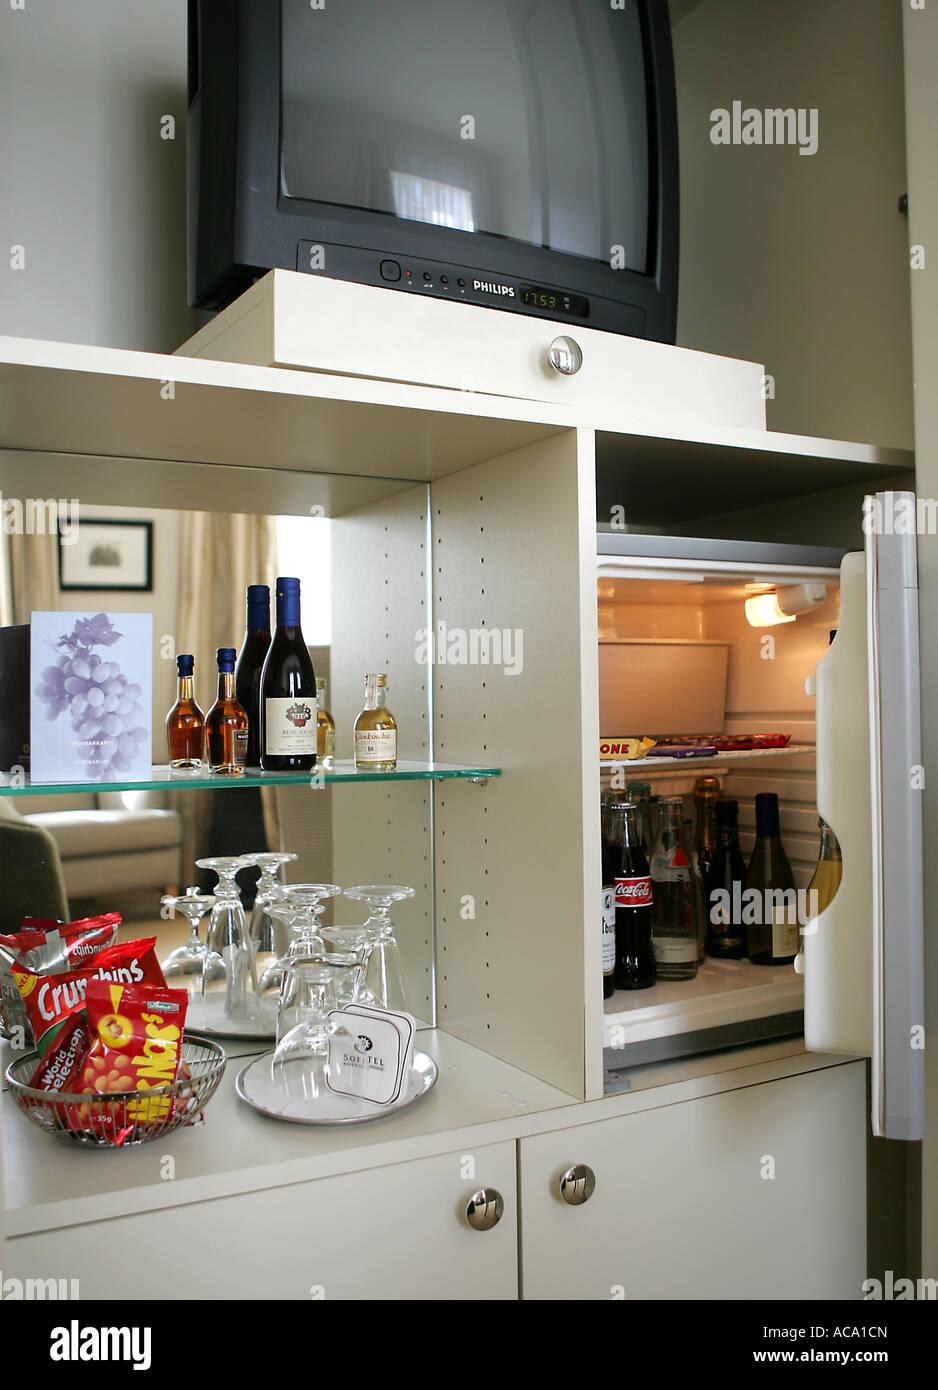 Minibar Hotel Stockfotos & Minibar Hotel Bilder - Alamy